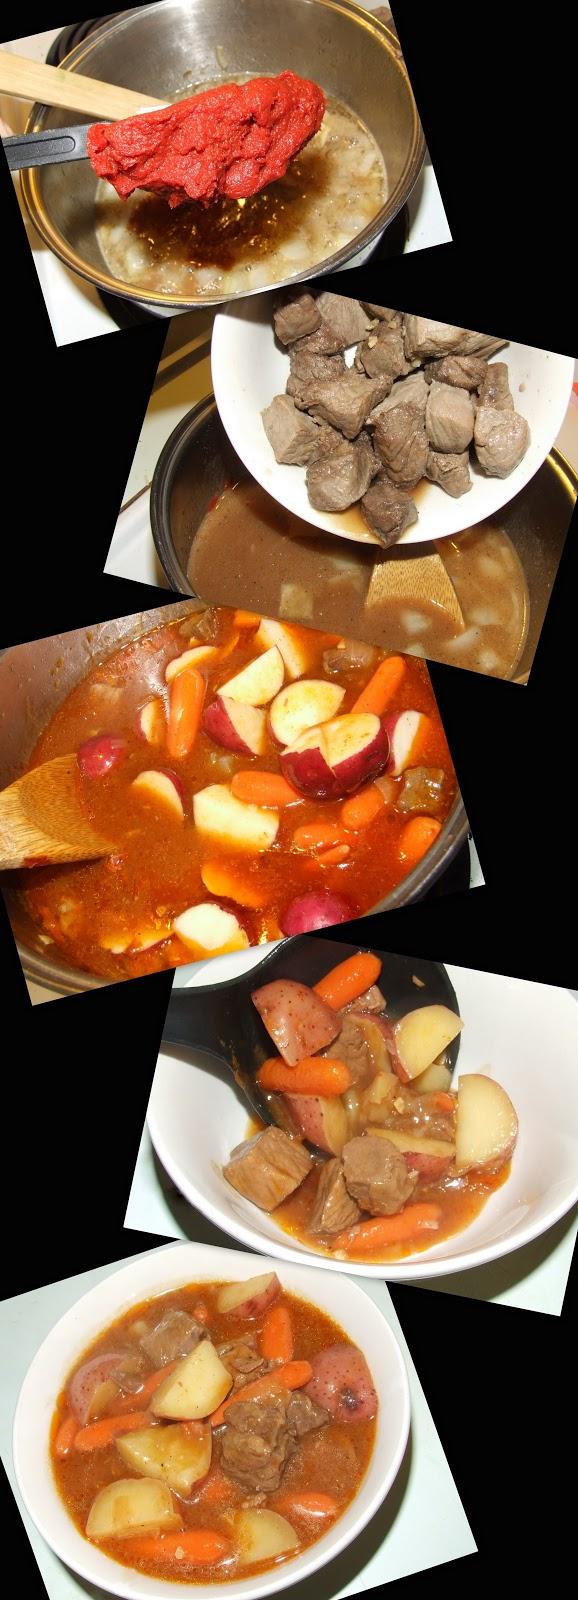 Bräuista: Cooking with Beer - Beer and Paprika Beef Stew